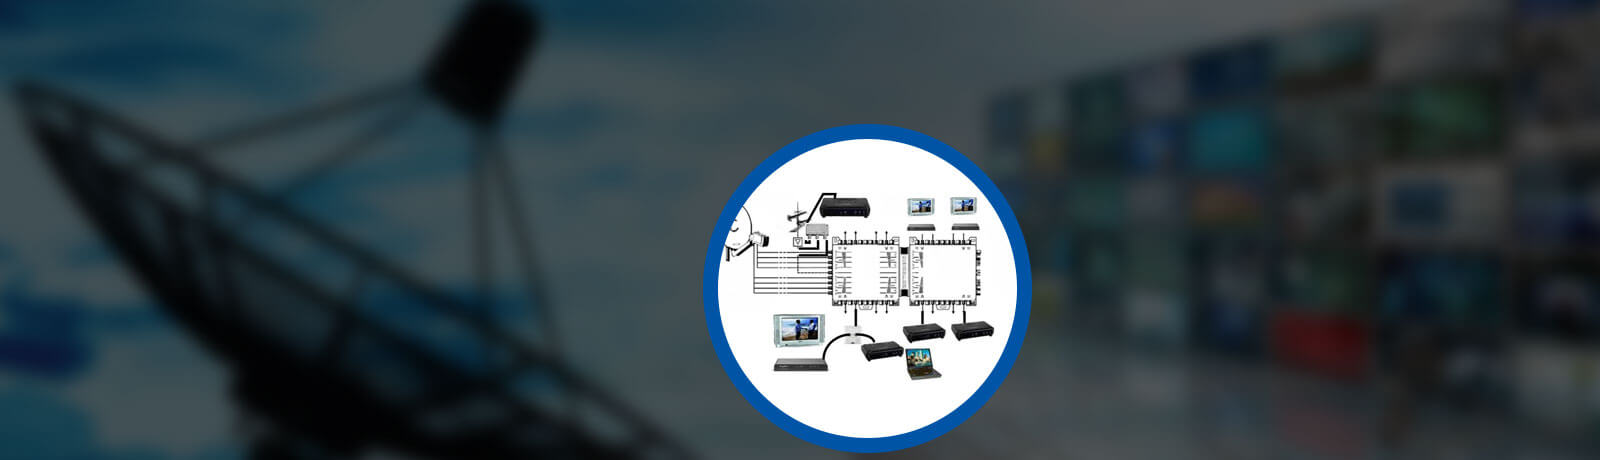 SMATV Installation Services in Dubai